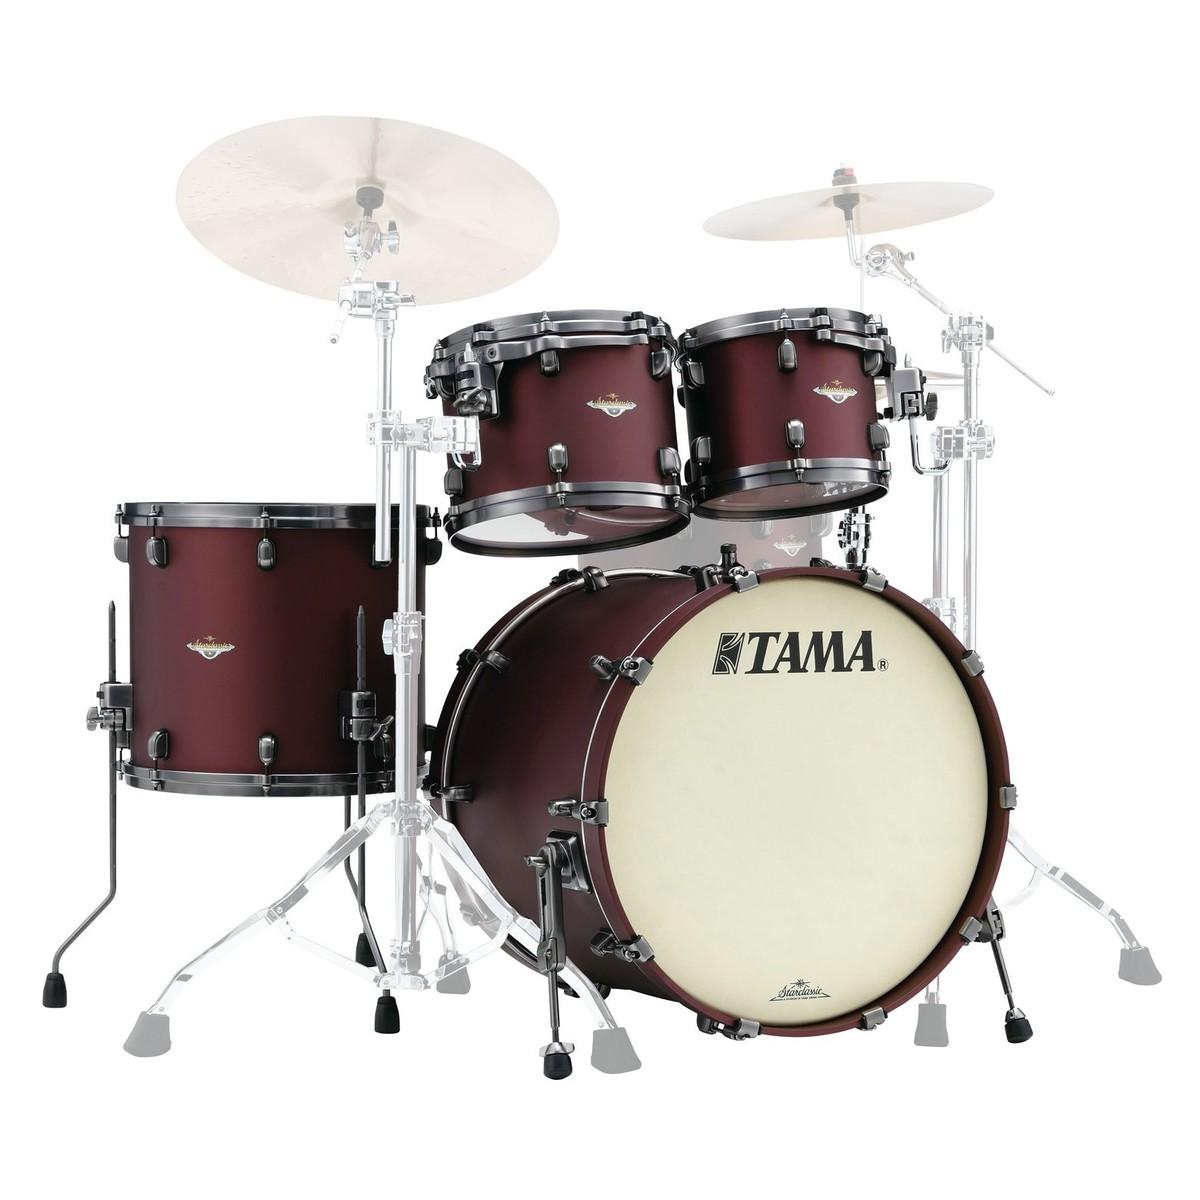 tama starclassic bubinga 22 4pc shell pack flat burgundy metallic at gear4music. Black Bedroom Furniture Sets. Home Design Ideas